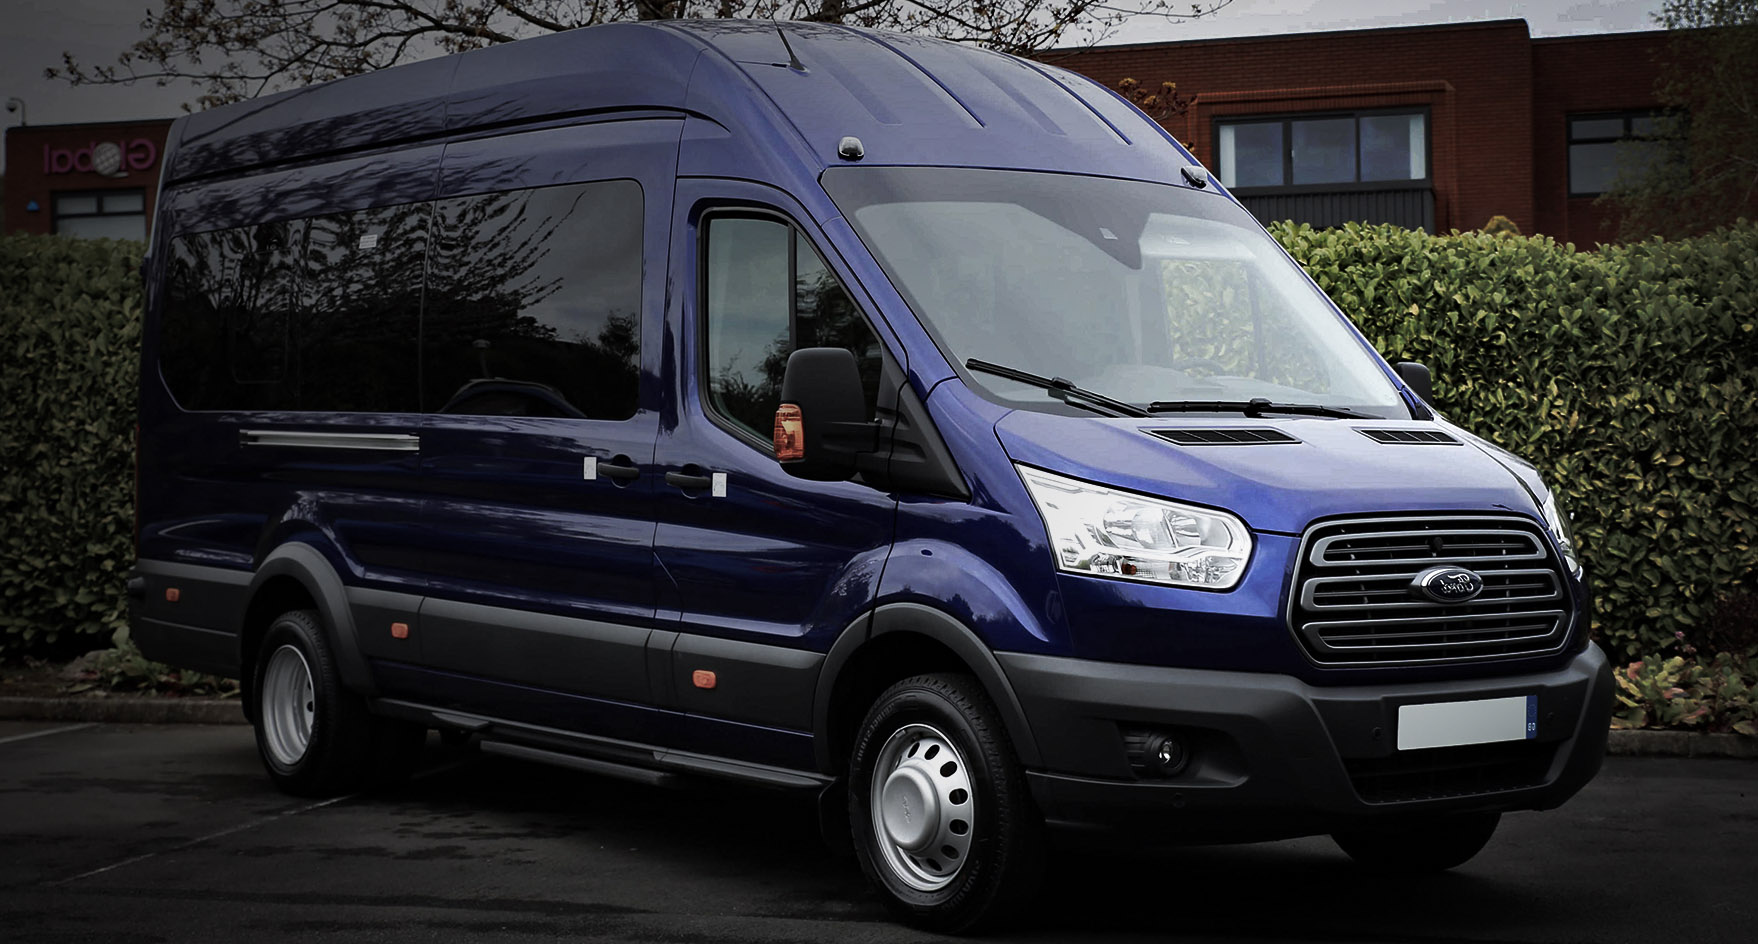 minibus, microbus, minivan, airport transfer, airportrun, airportshuttle